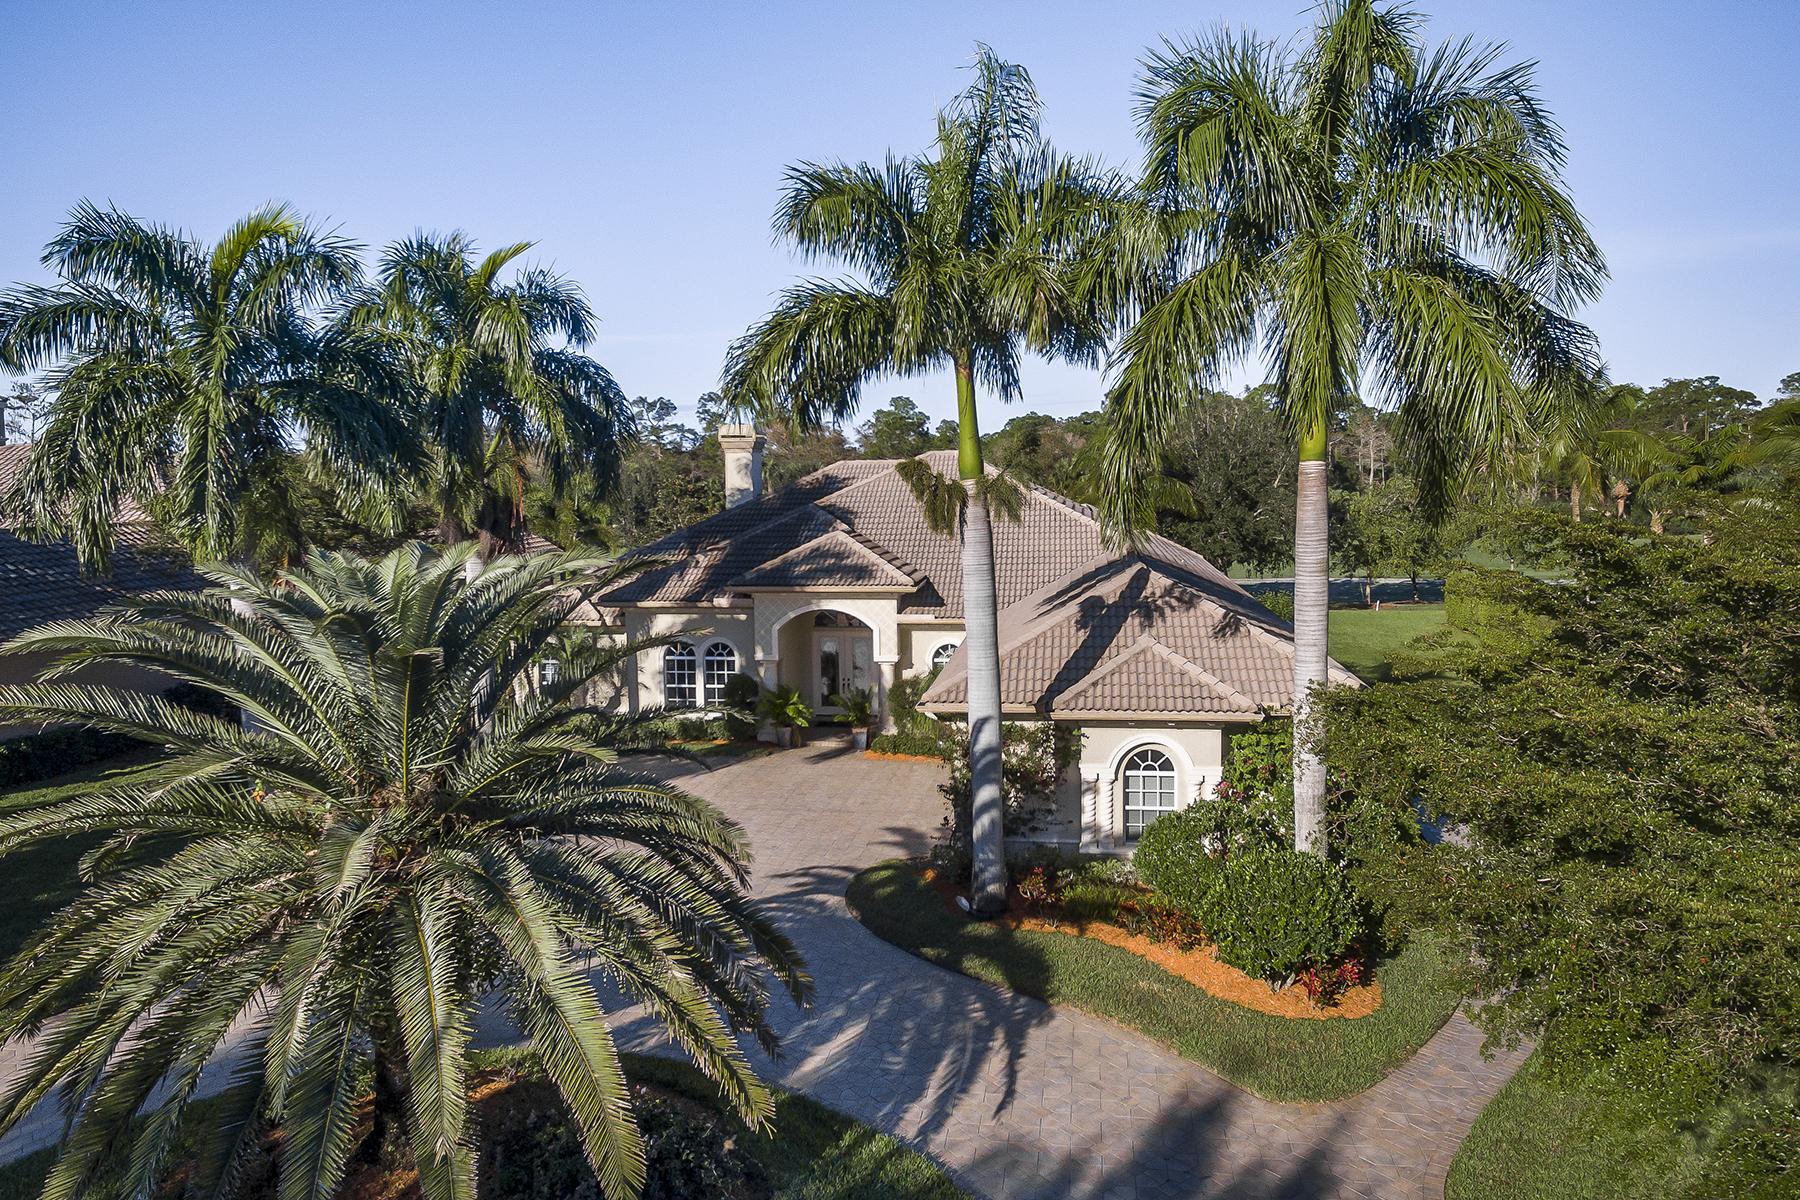 Single Family Home for Sale at LELY RESORT - CLASSICS PLANTATION ESTATES 7619 Palmer Ct Naples, Florida, 34113 United States